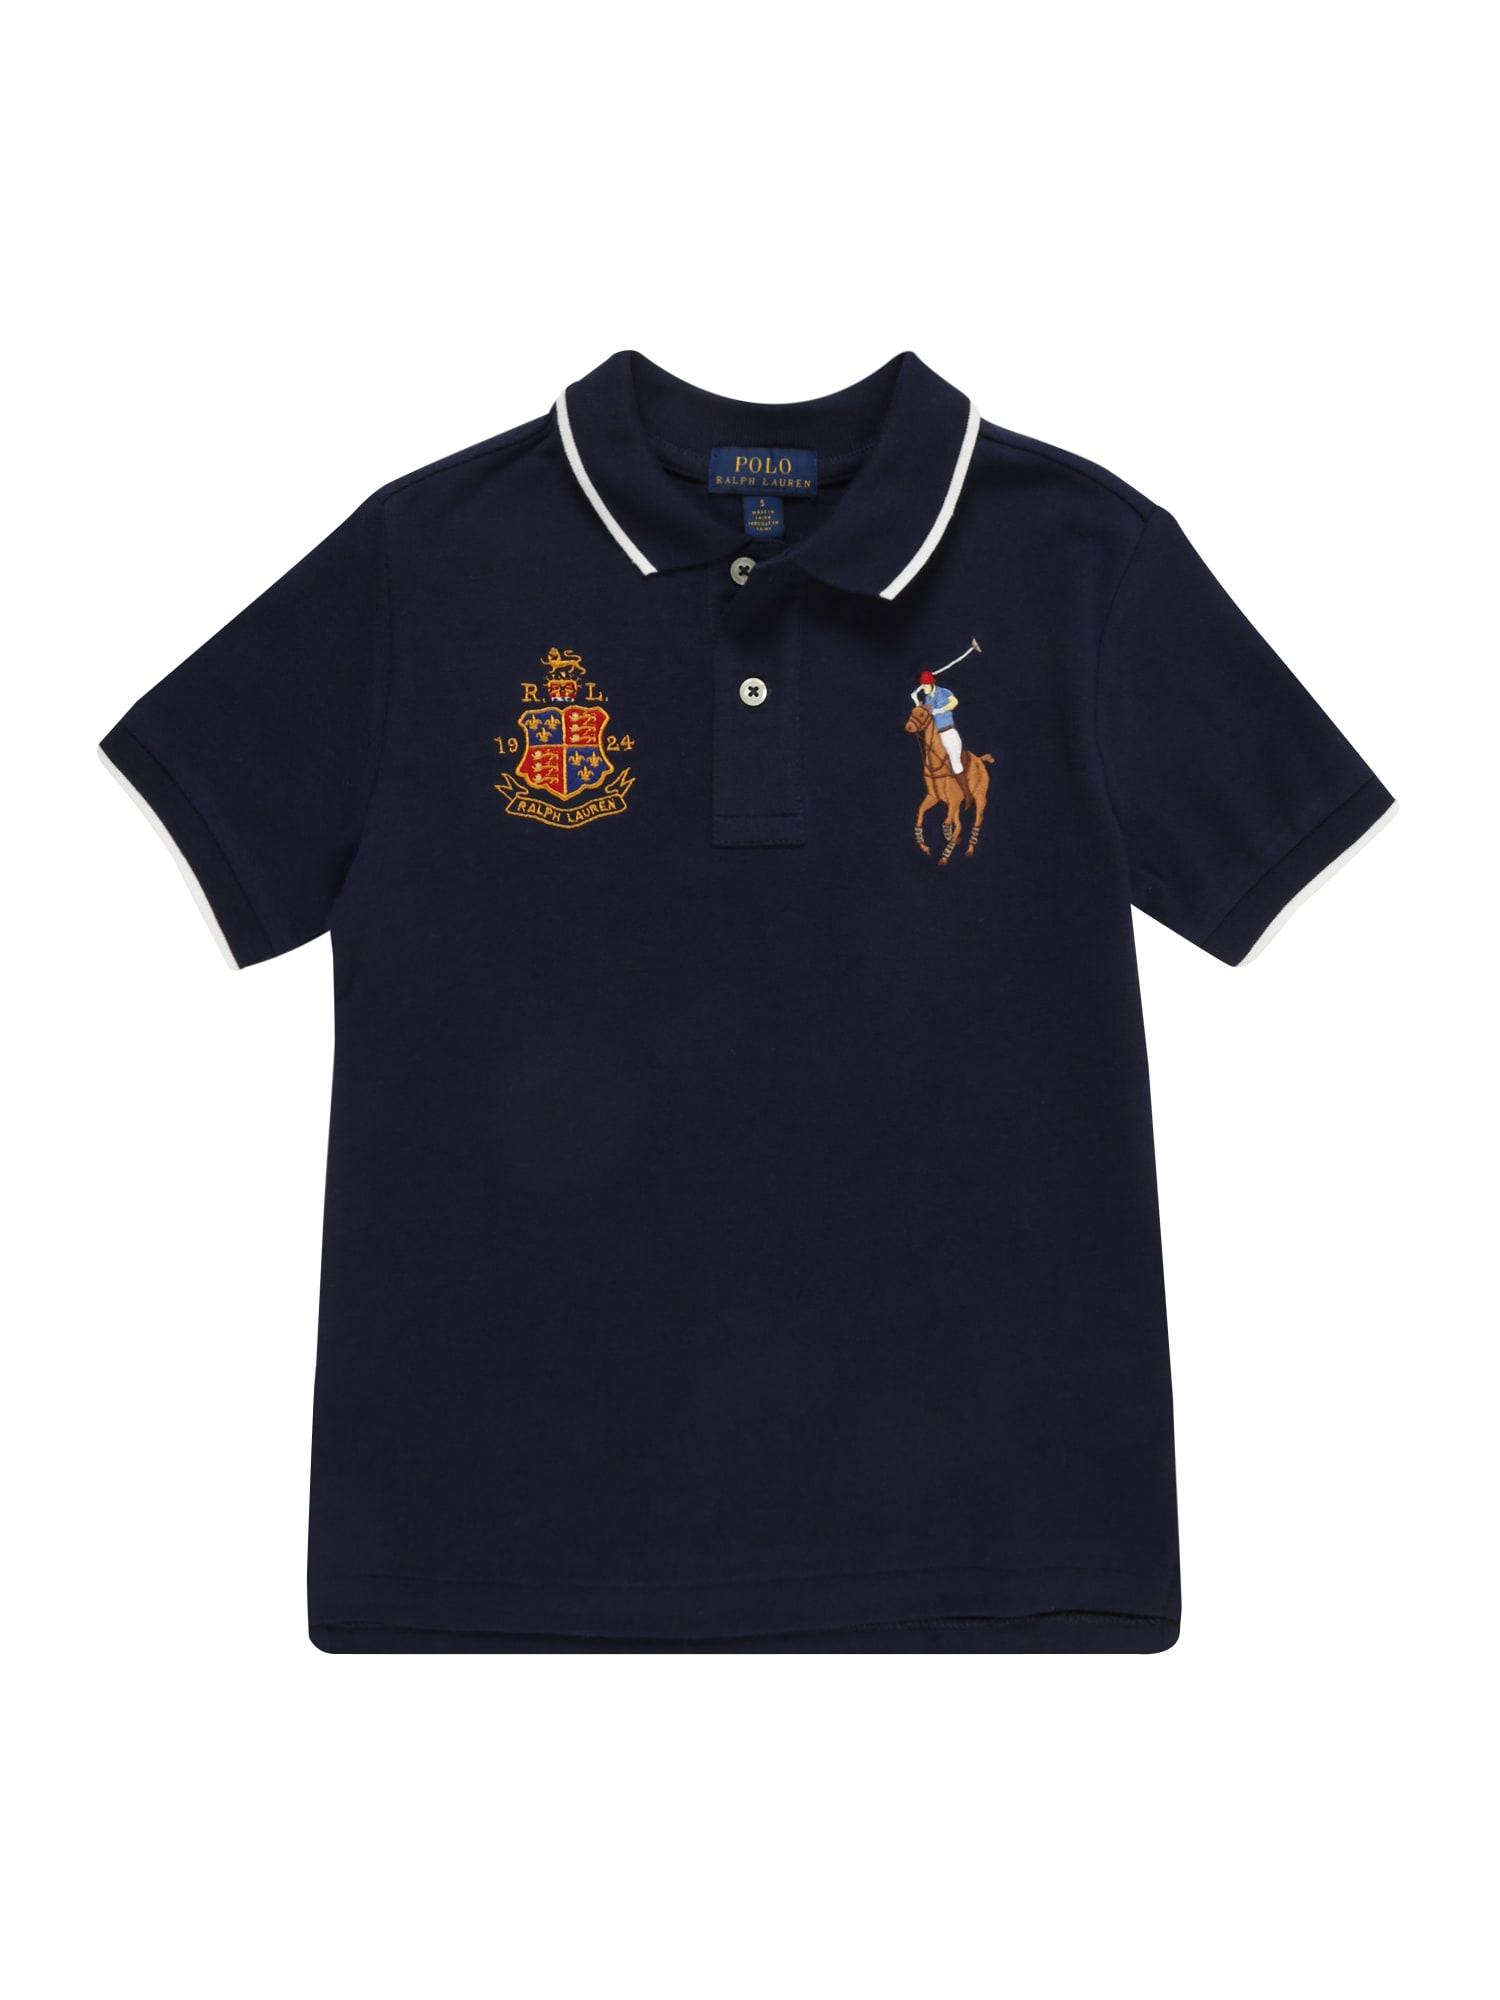 Tričko FEATHERWEIGHT MESH námořnická modř POLO RALPH LAUREN